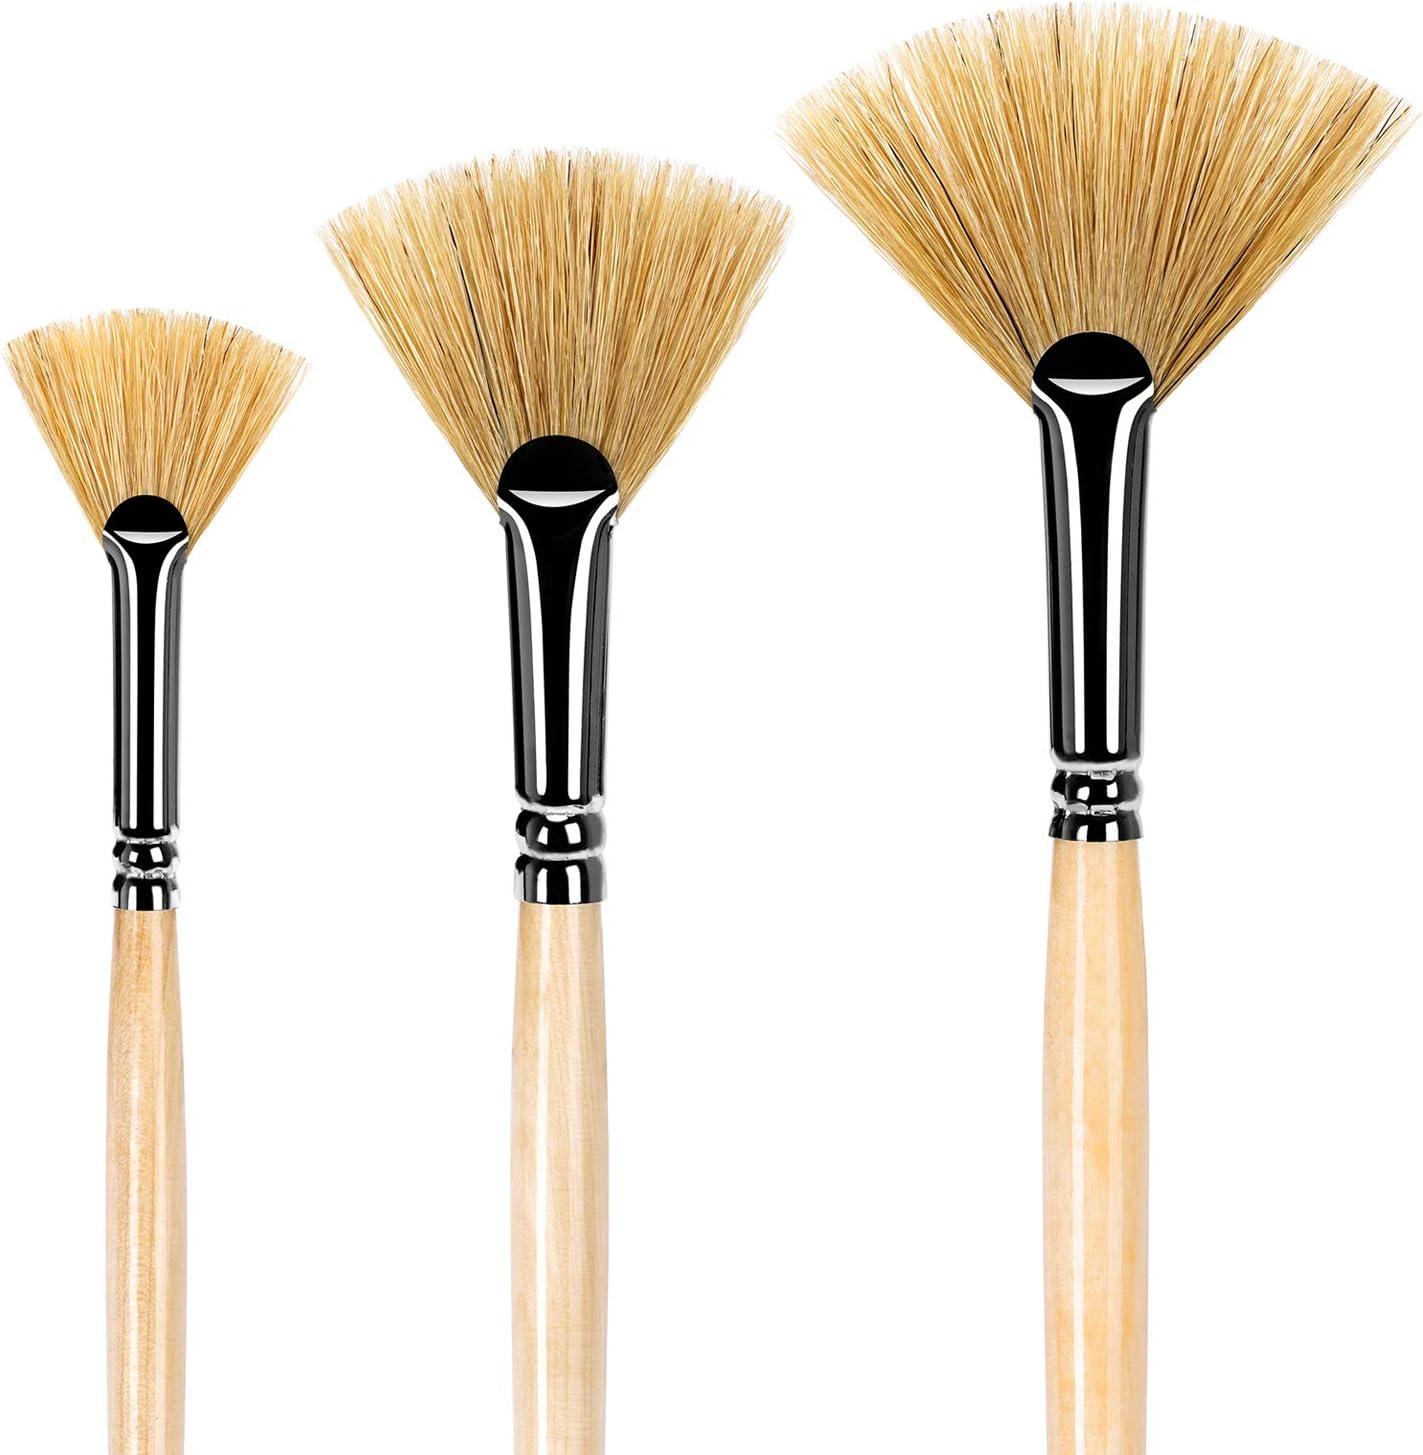 Fan Brush Set Hog Bristle Hair 3pcs Artist Soft Anti-Shedding Paint Brushes for Acrylic Watercolor Oil Painting